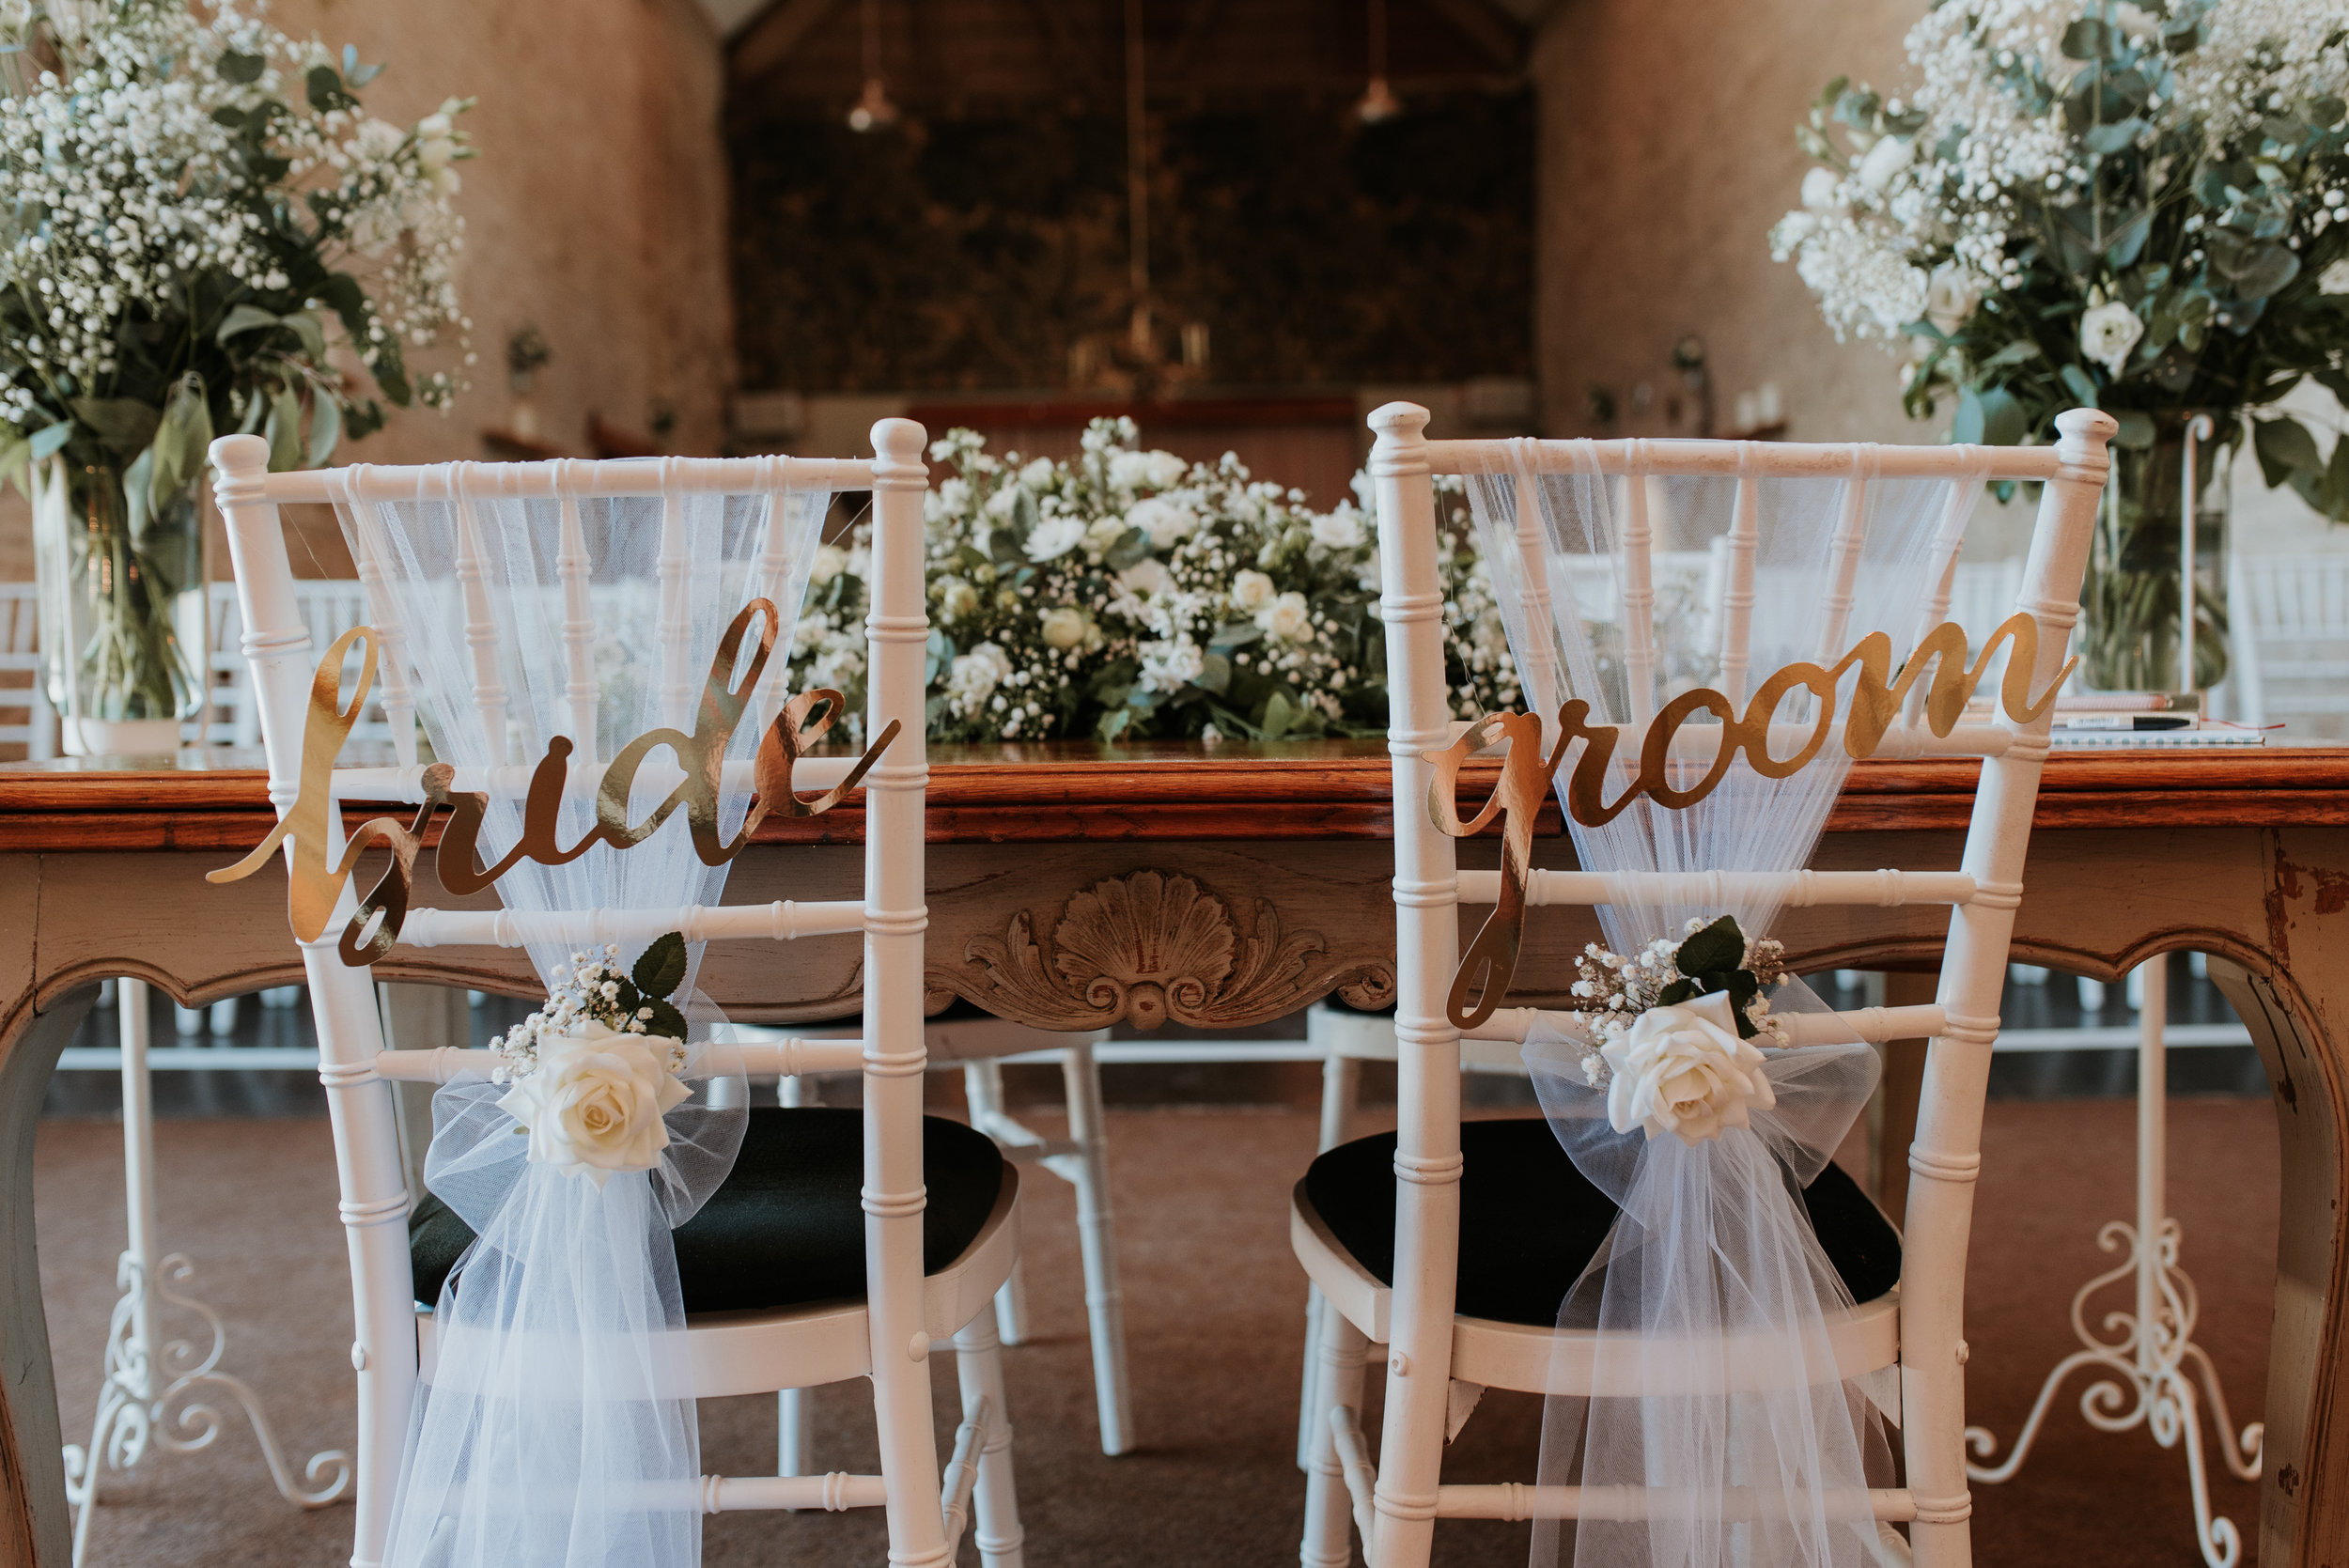 Oxfordshire-wedding-photographer-16.jpg